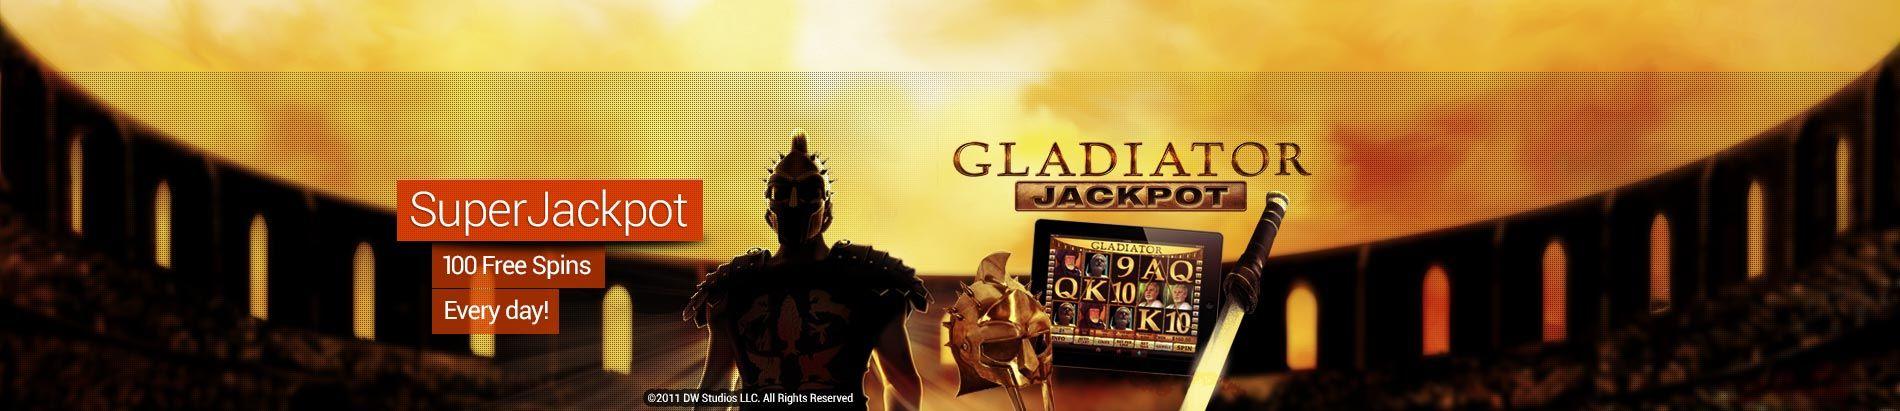 gladiator jackpot free spins